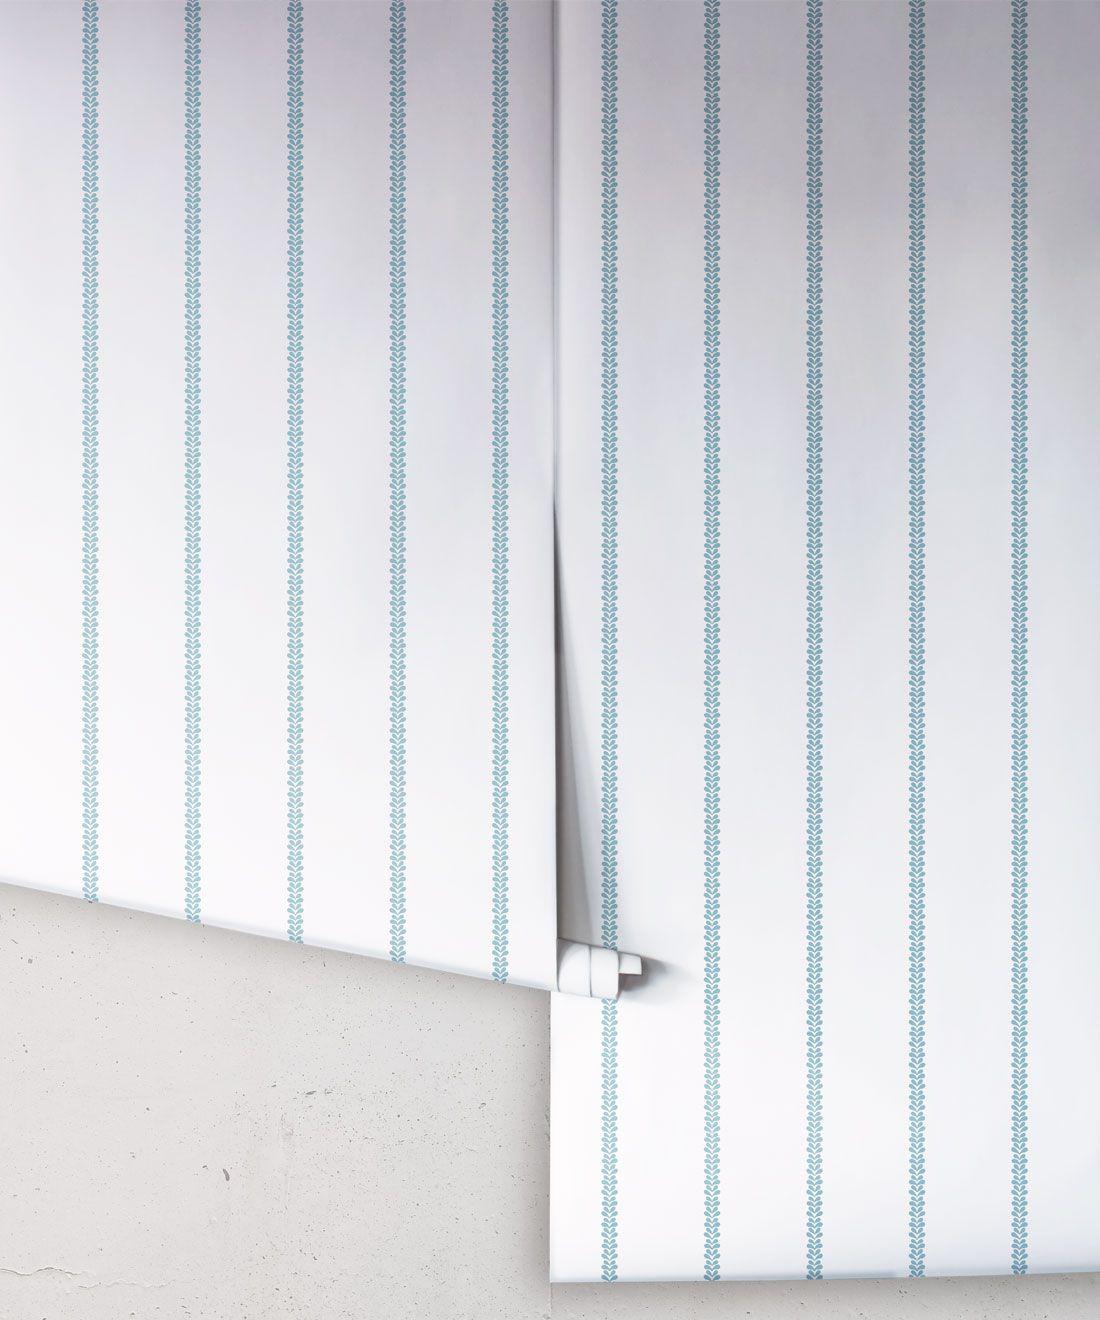 Chemin Wallpaper • Striped Wallpaper • Powder Blue • Rolls